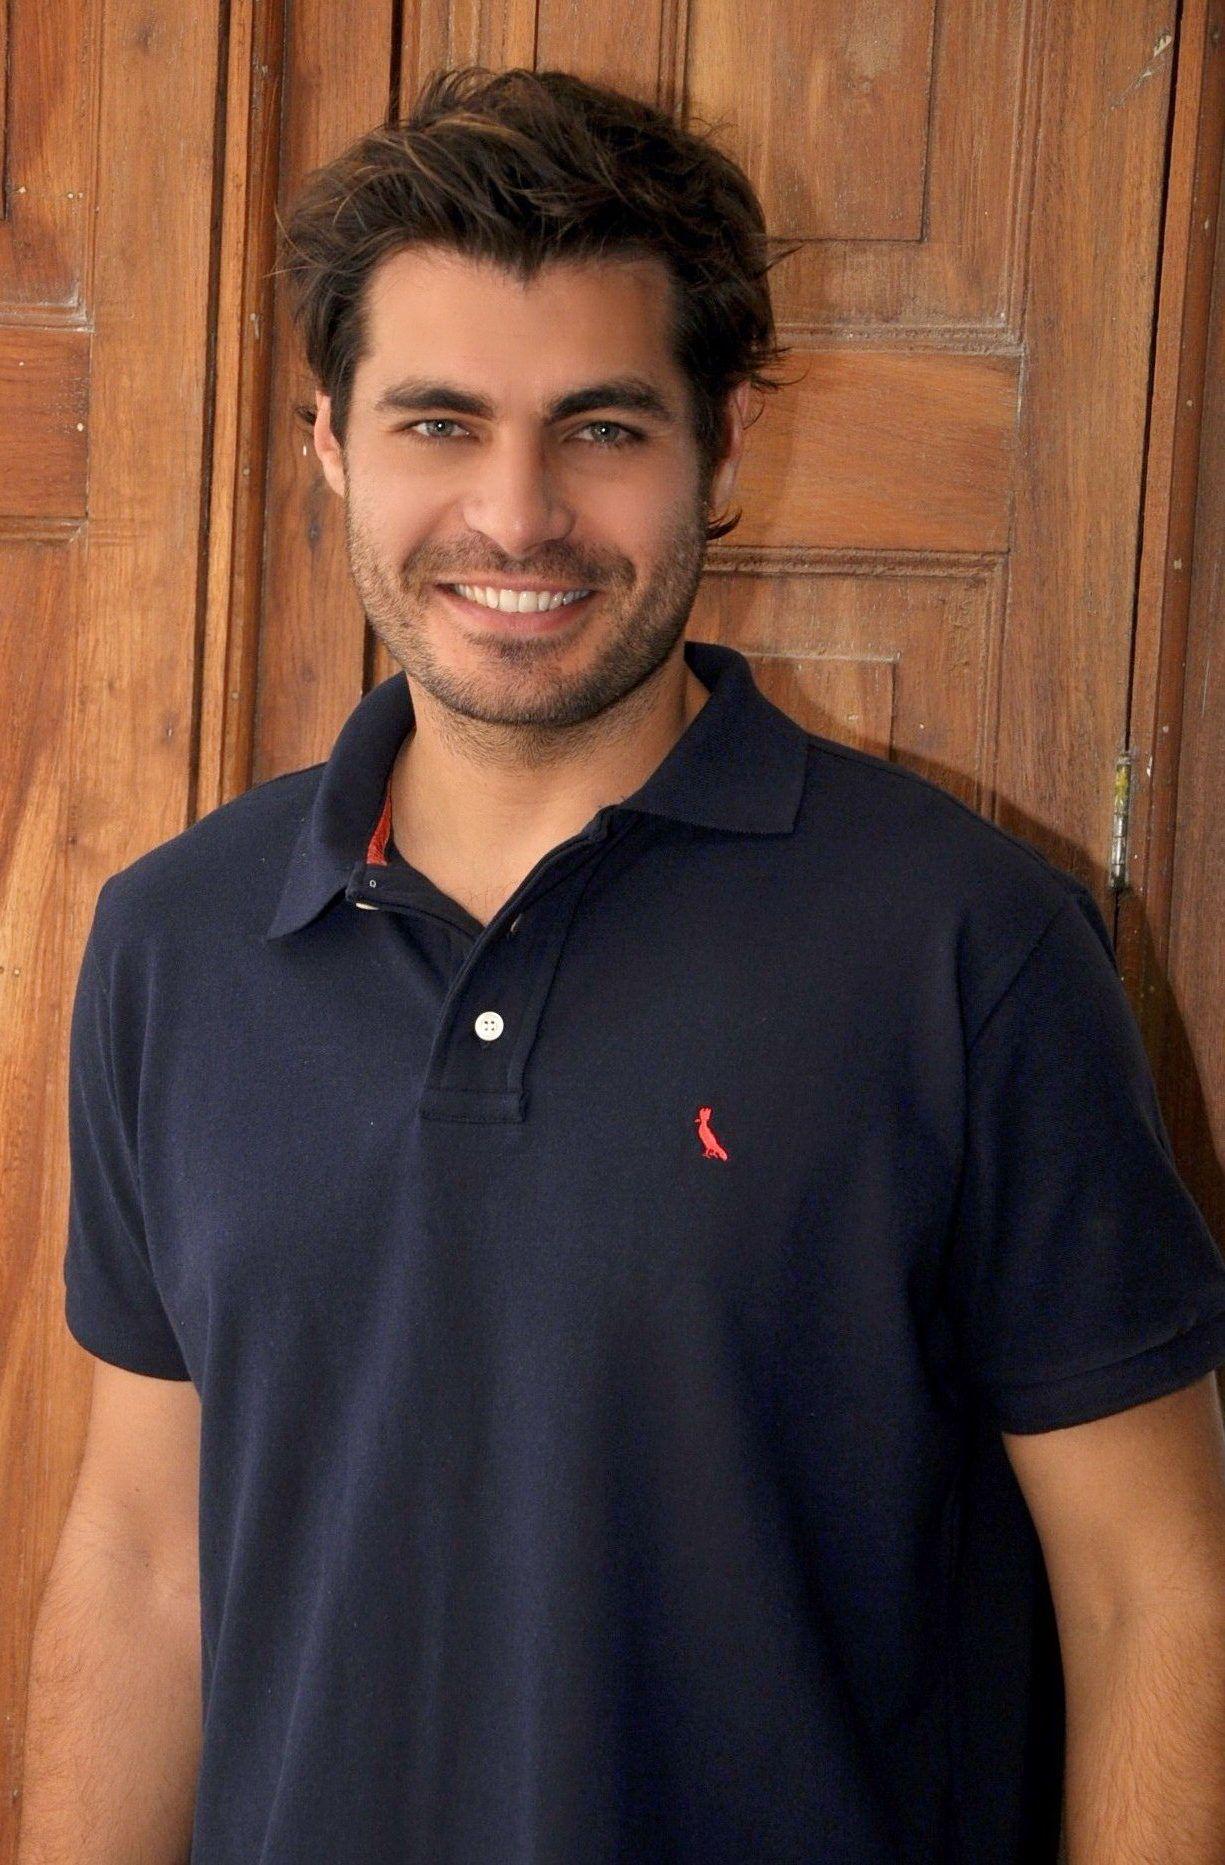 Thiago Lacerda Ator Brazilian Beauty Handsome Faces Beautiful Men